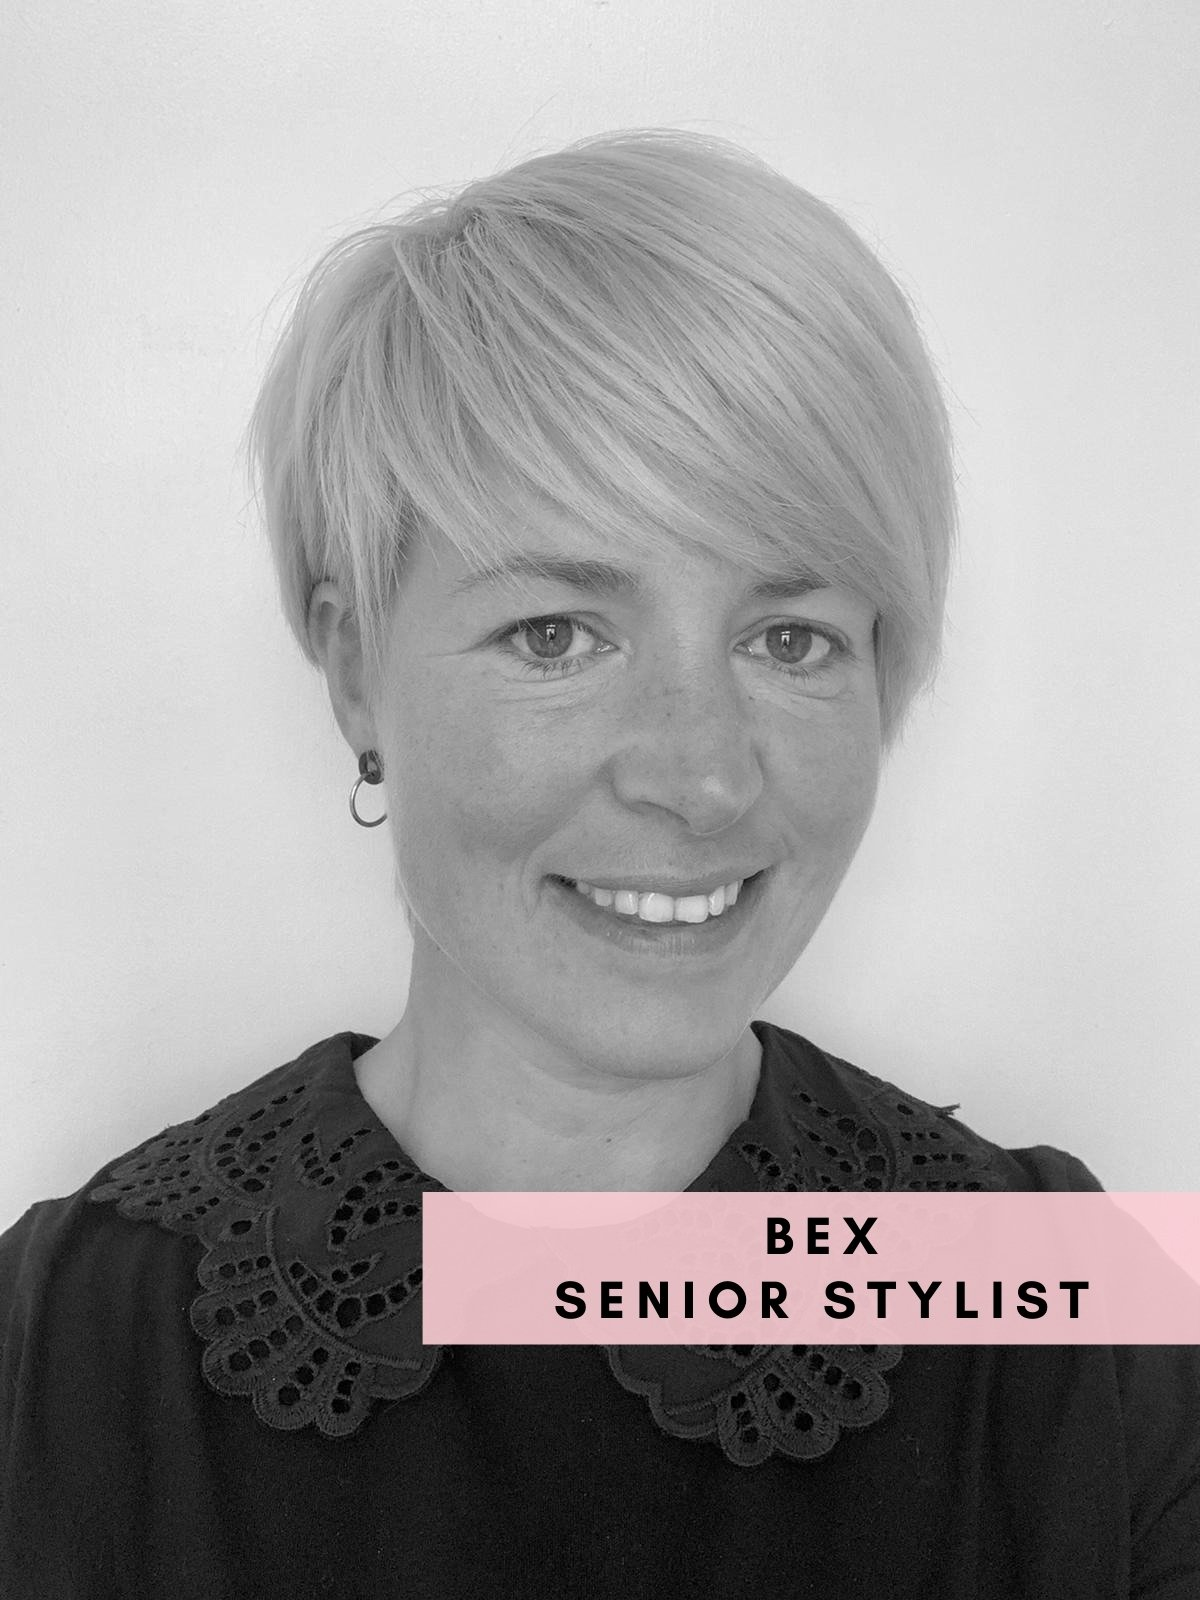 Bex – Senior Stylist